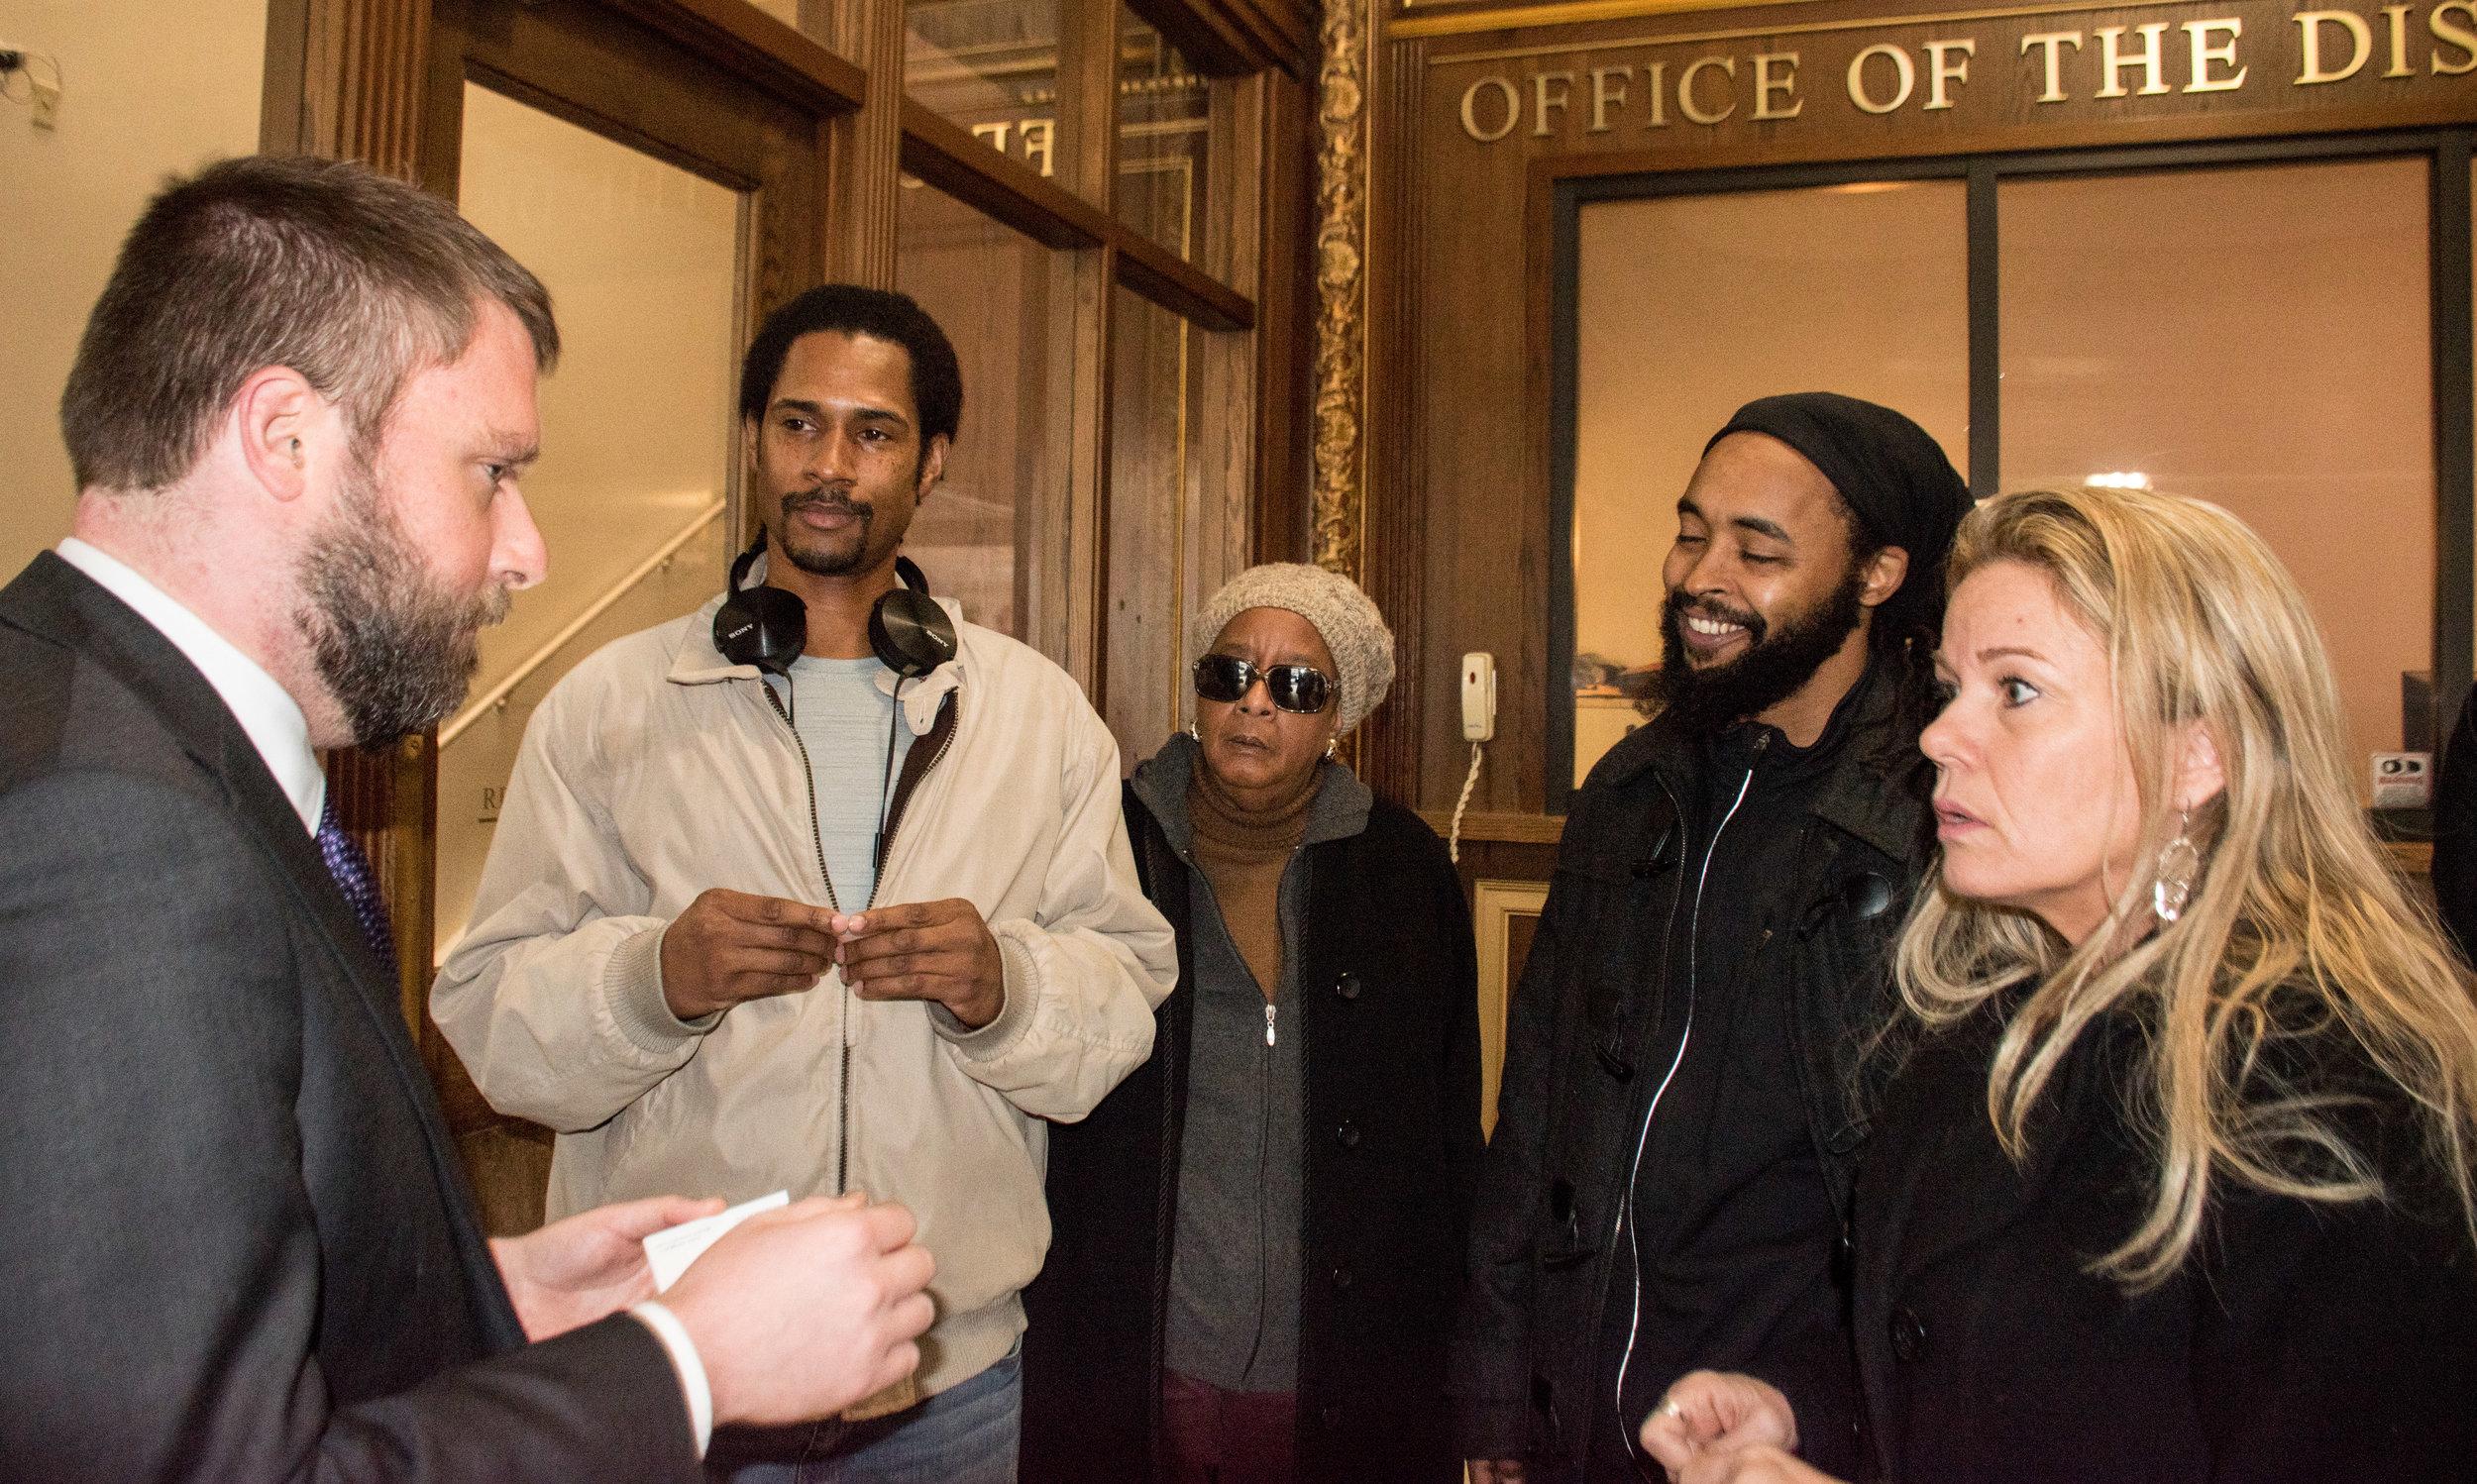 Jan 7, 2019 Thousands of Mumia Abu-Jamal Petitions delivered to DA Krasner  L to R: Ben Waxman, Mike Africa Jr, Linda Ragin, Wayne Cook, Sandy Joy